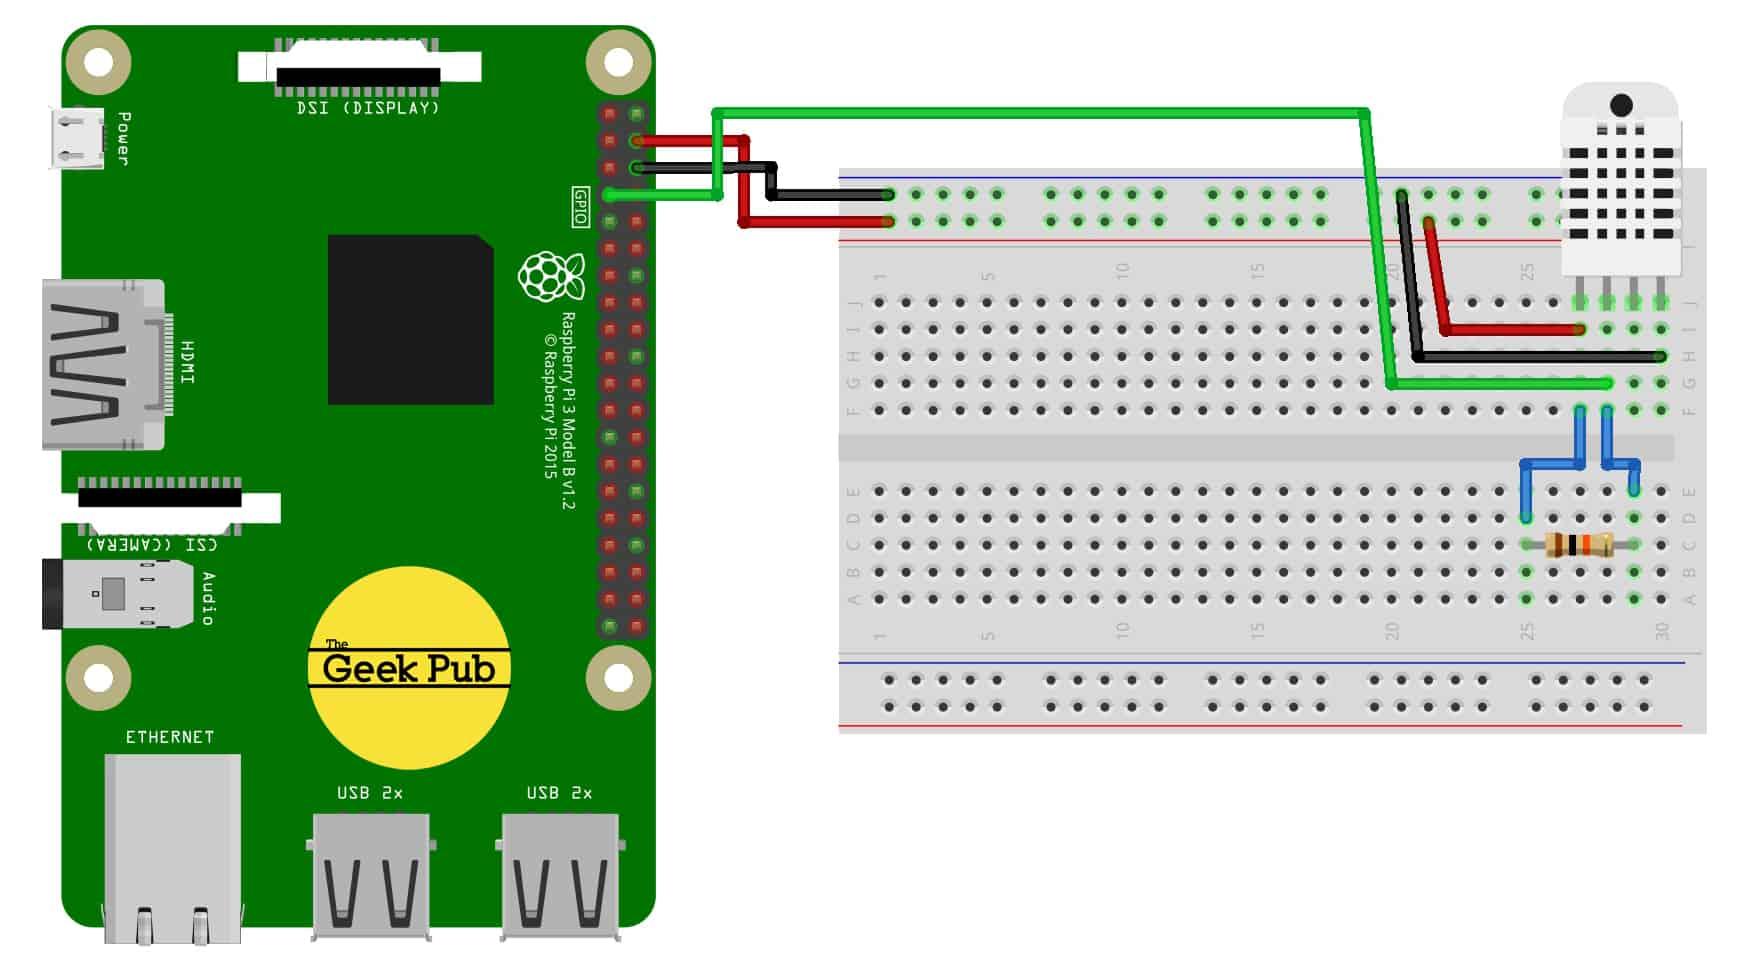 Stupendous Using The Dht11 Temperature Sensor With The Raspberry Pi The Geek Pub Wiring Database Ilarigelartorg